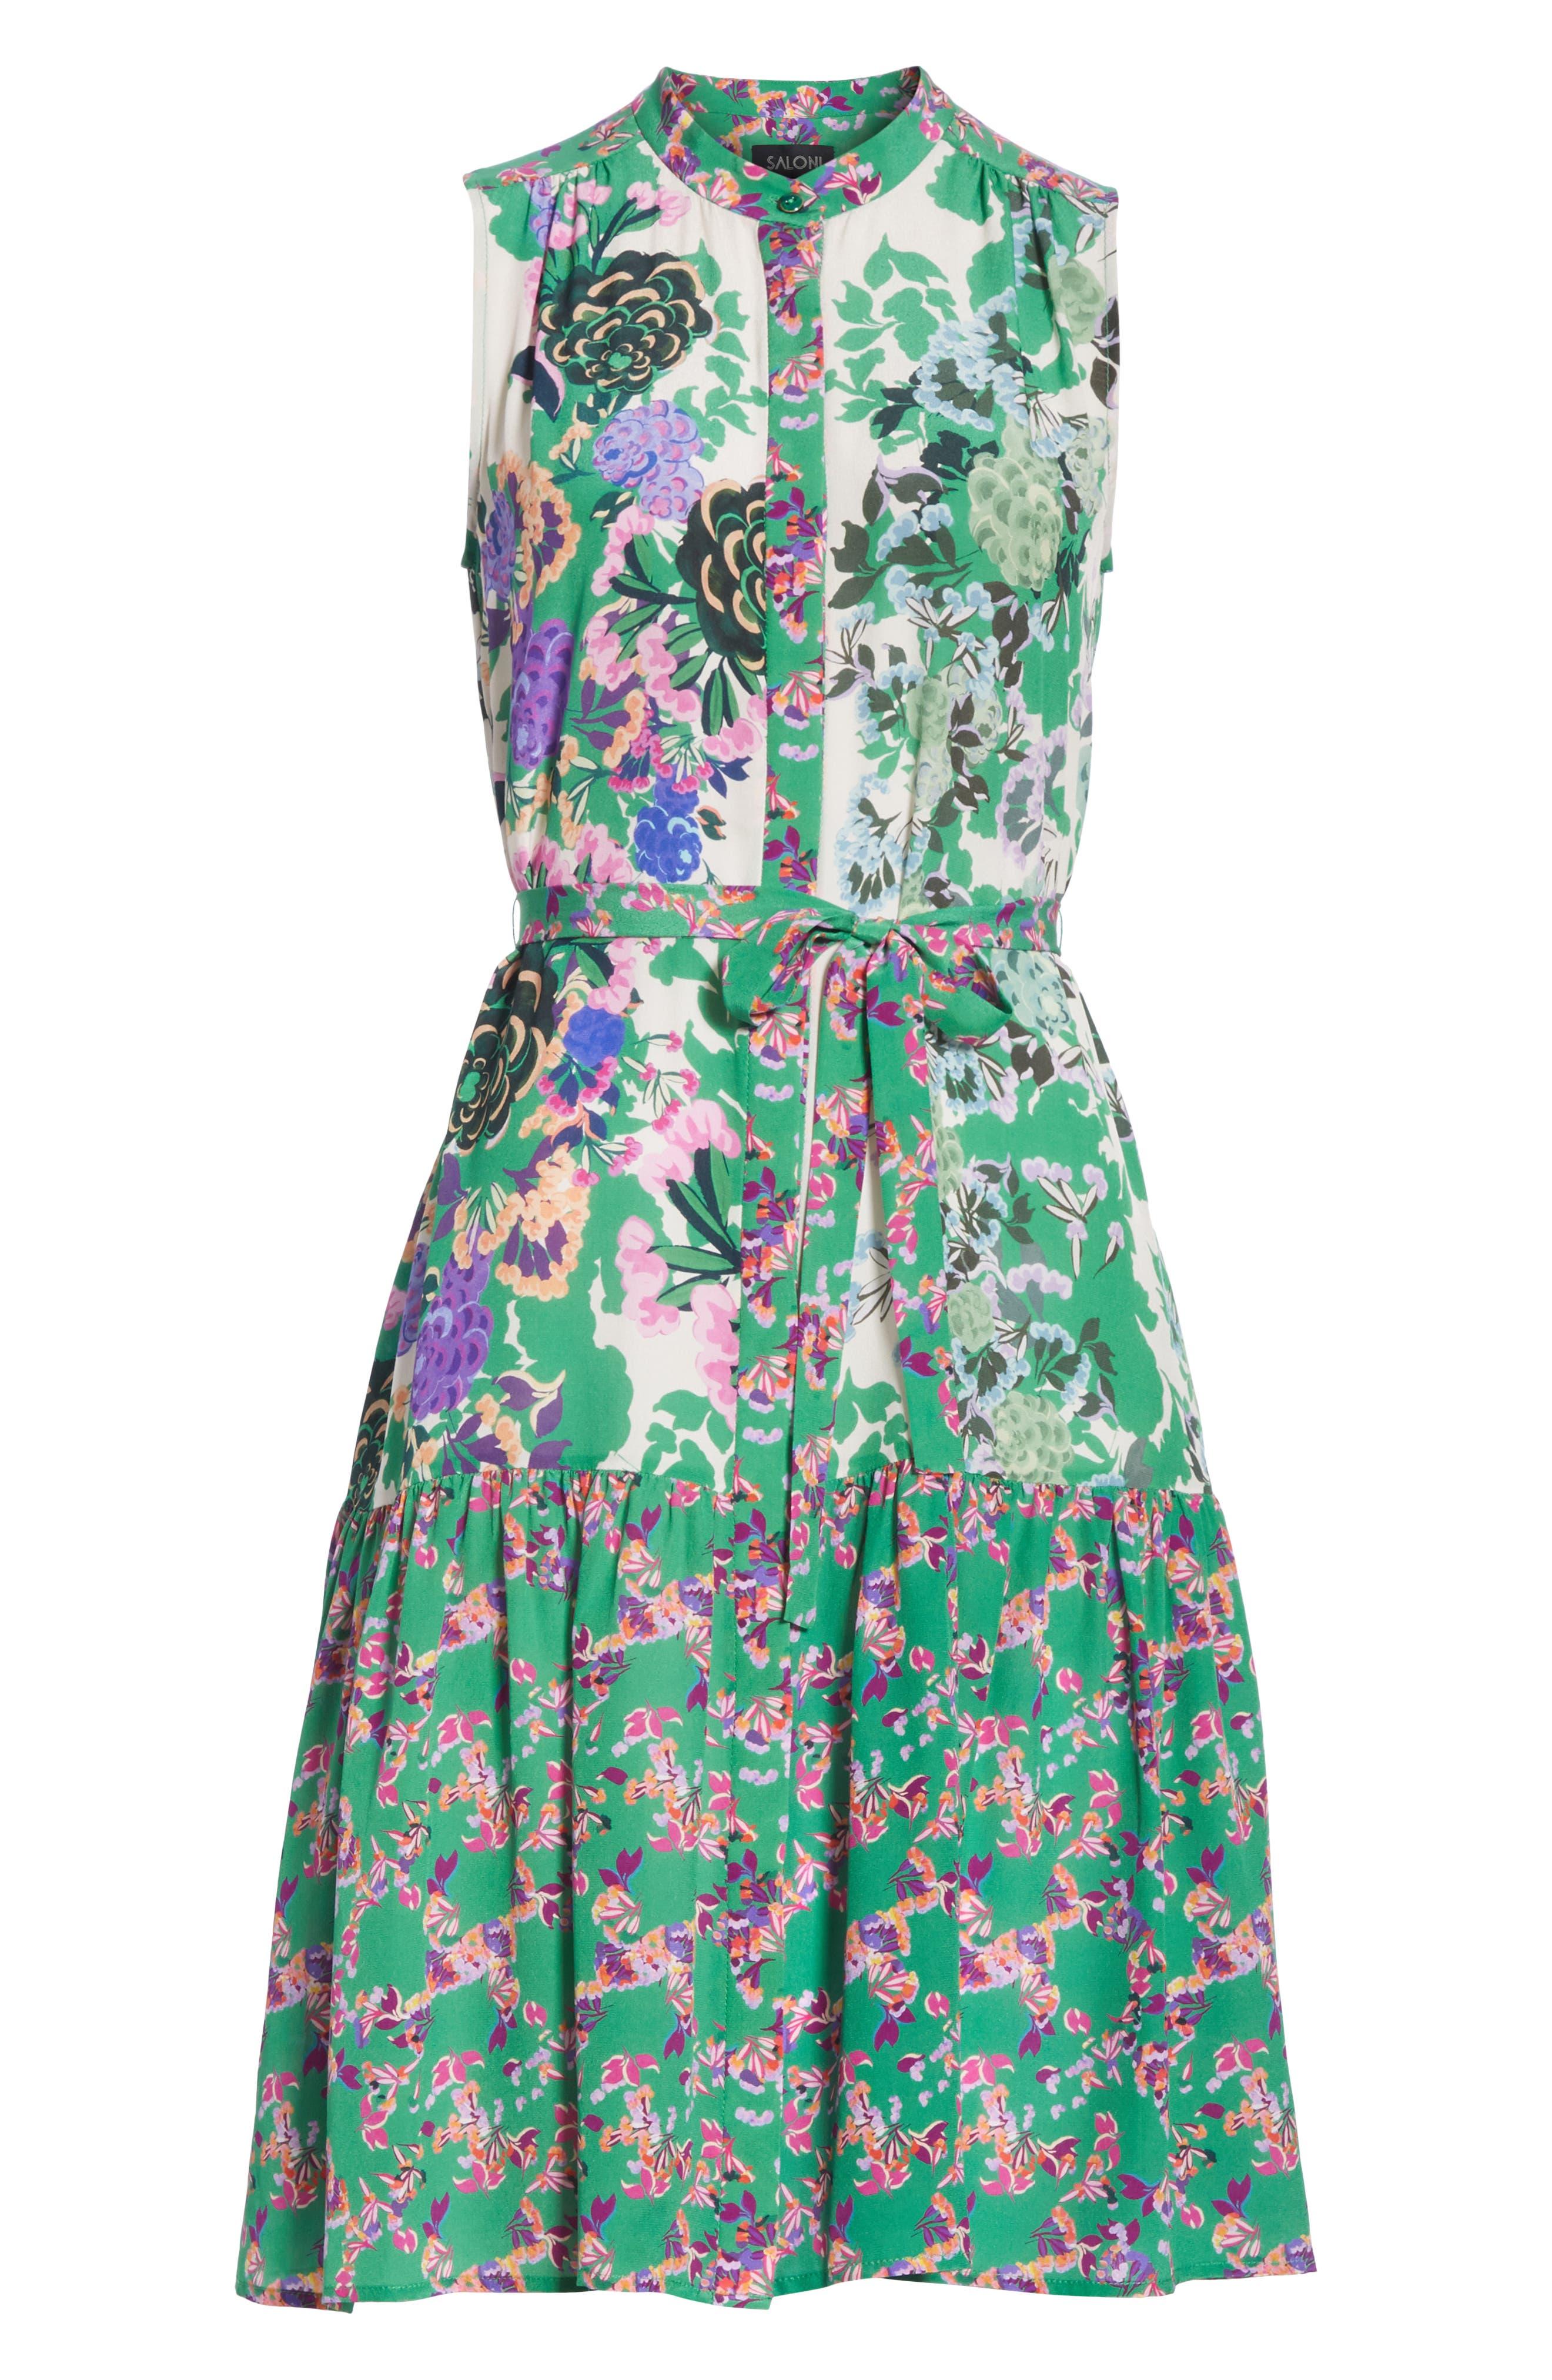 SALONI, Tilly Print Silk Dress, Alternate thumbnail 6, color, ROSE MEADOW PLMT